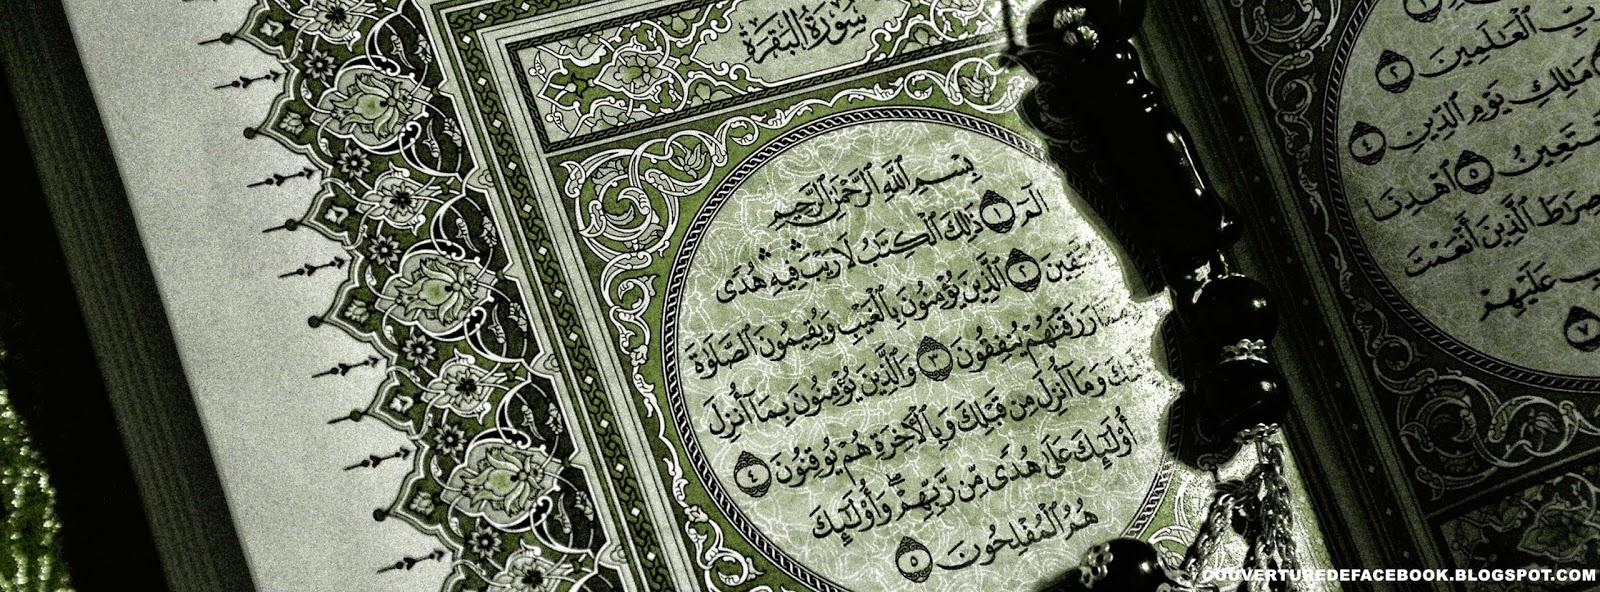 Couverture Facebook Islam